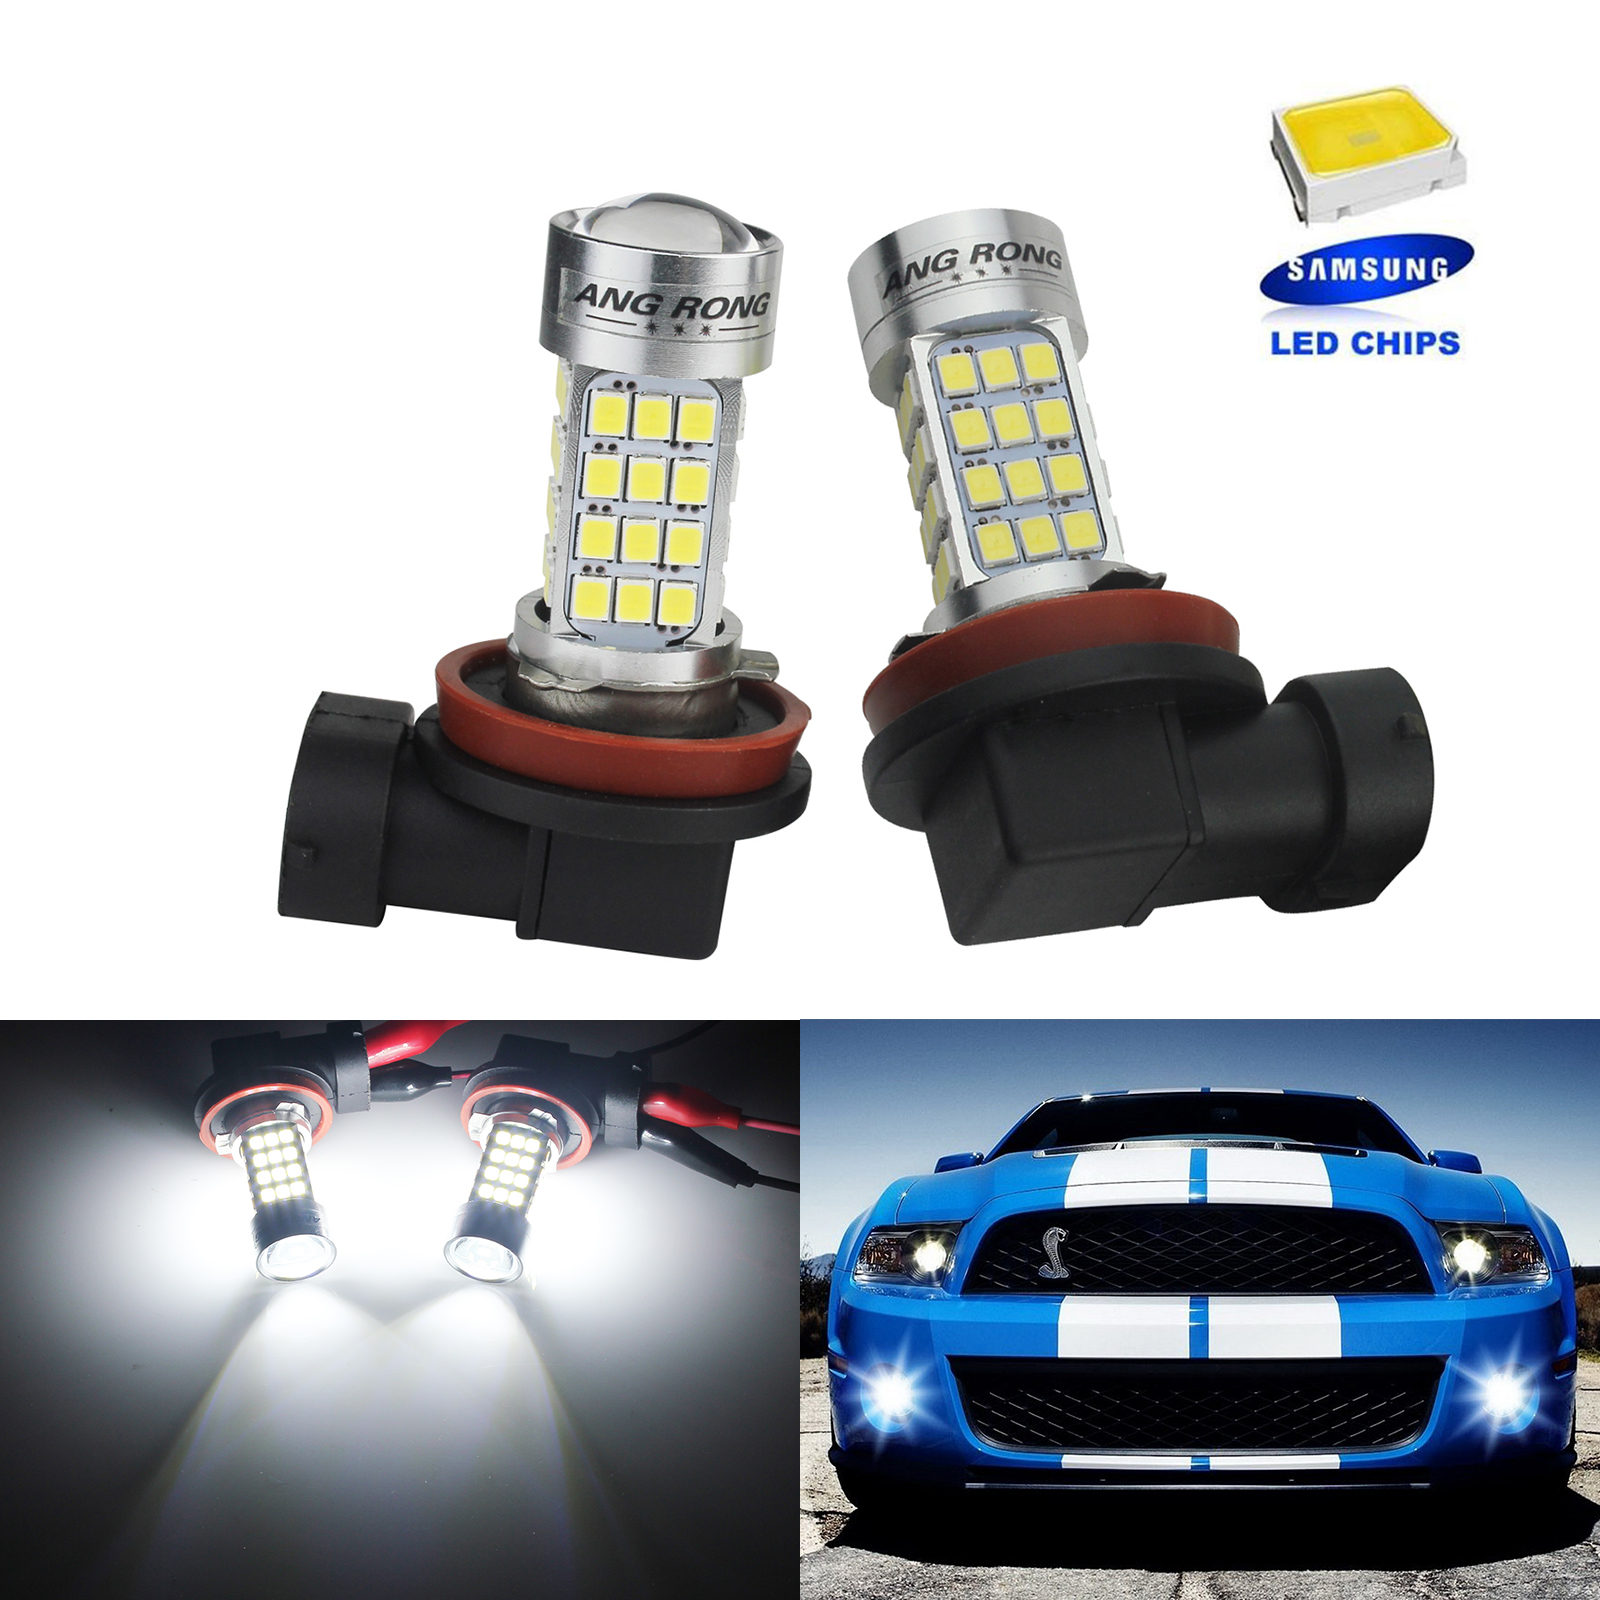 ANGRONG 2x White H11 H8 SAMSUNG LED 45W Projector Sidelight Daytime Fog Light Bulbs 6000K